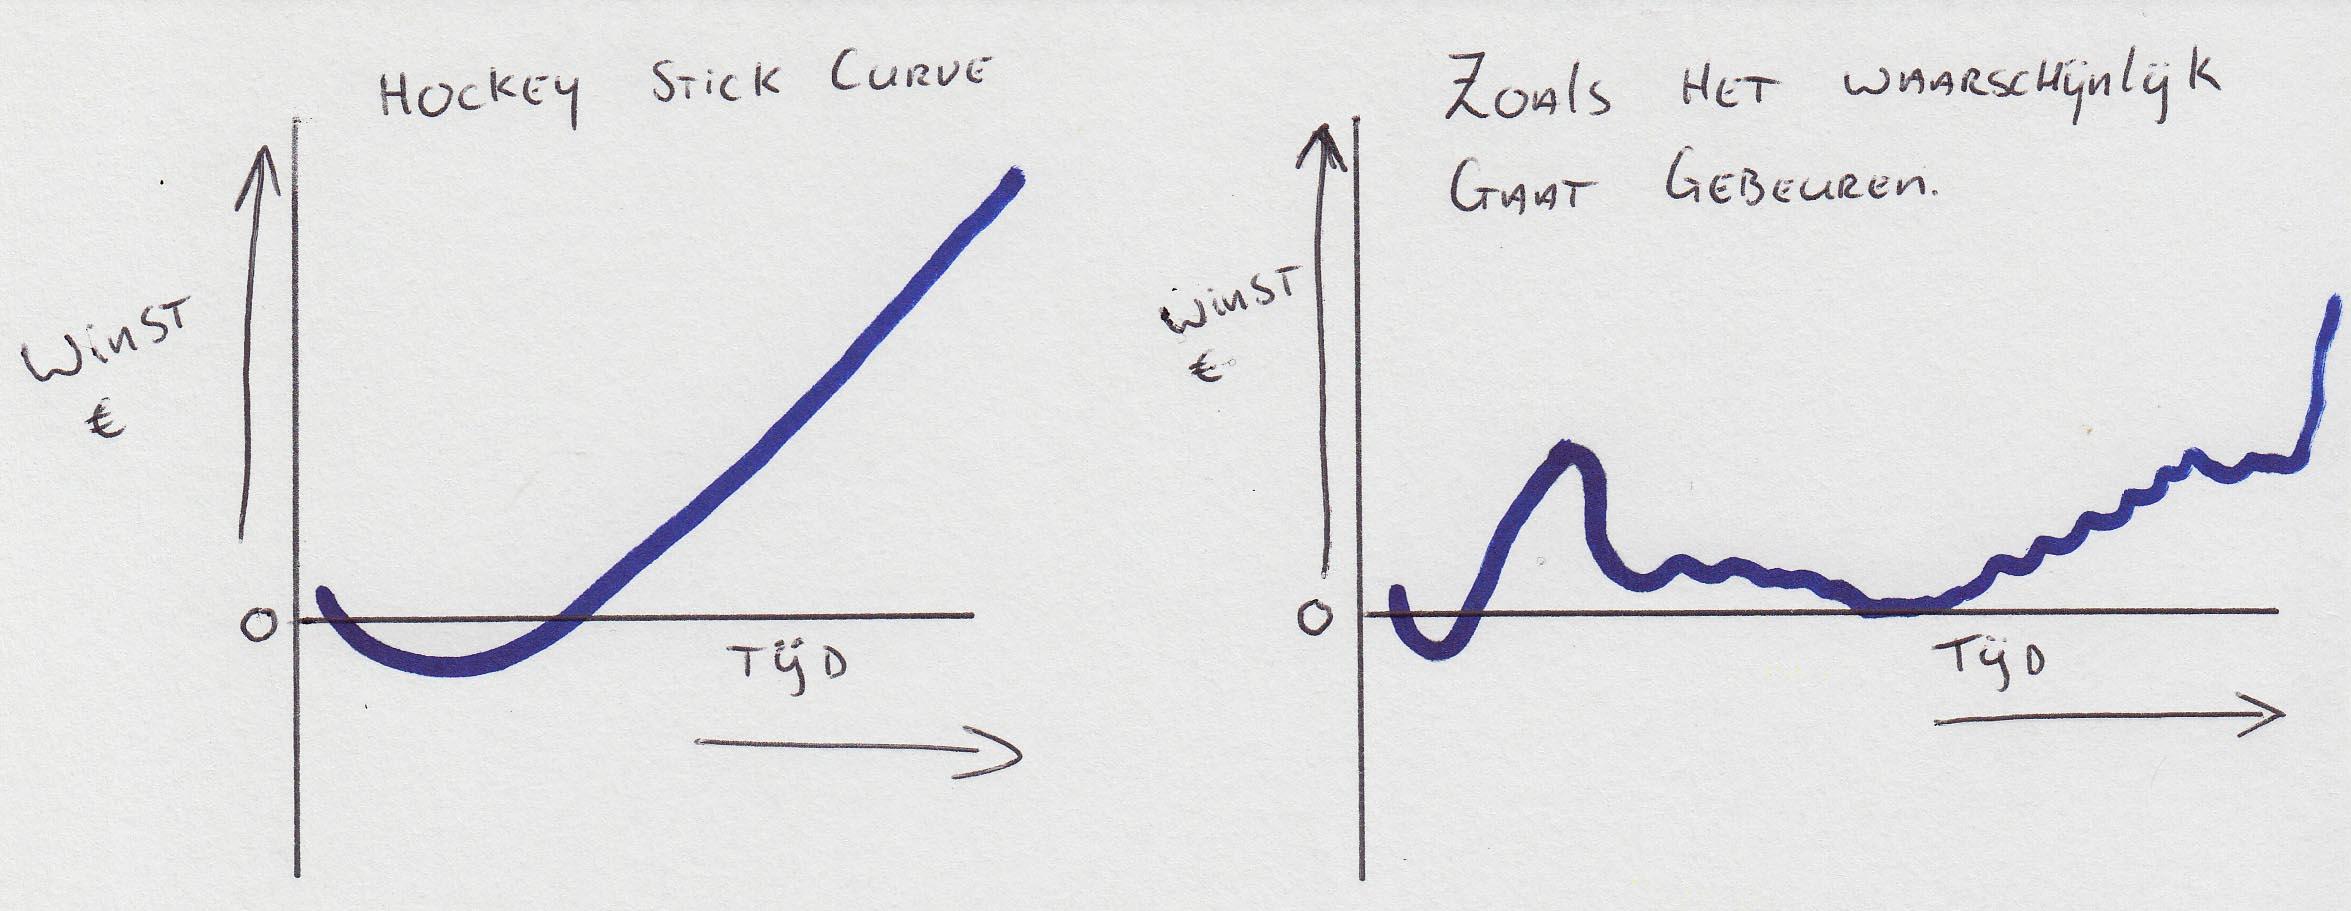 Hocky Curve.jpg